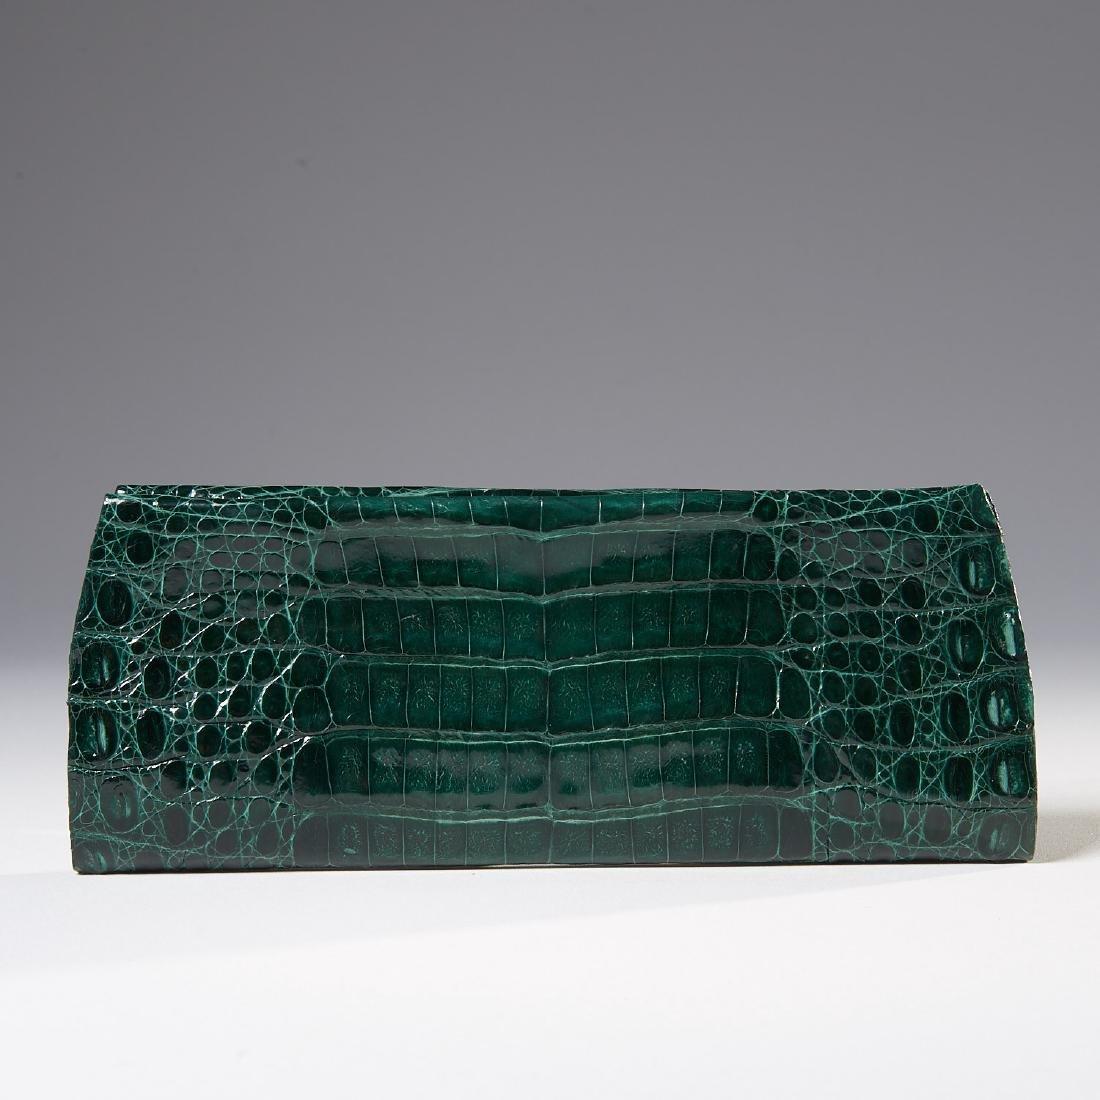 Gambelle green glazed crocodile clutch handbag